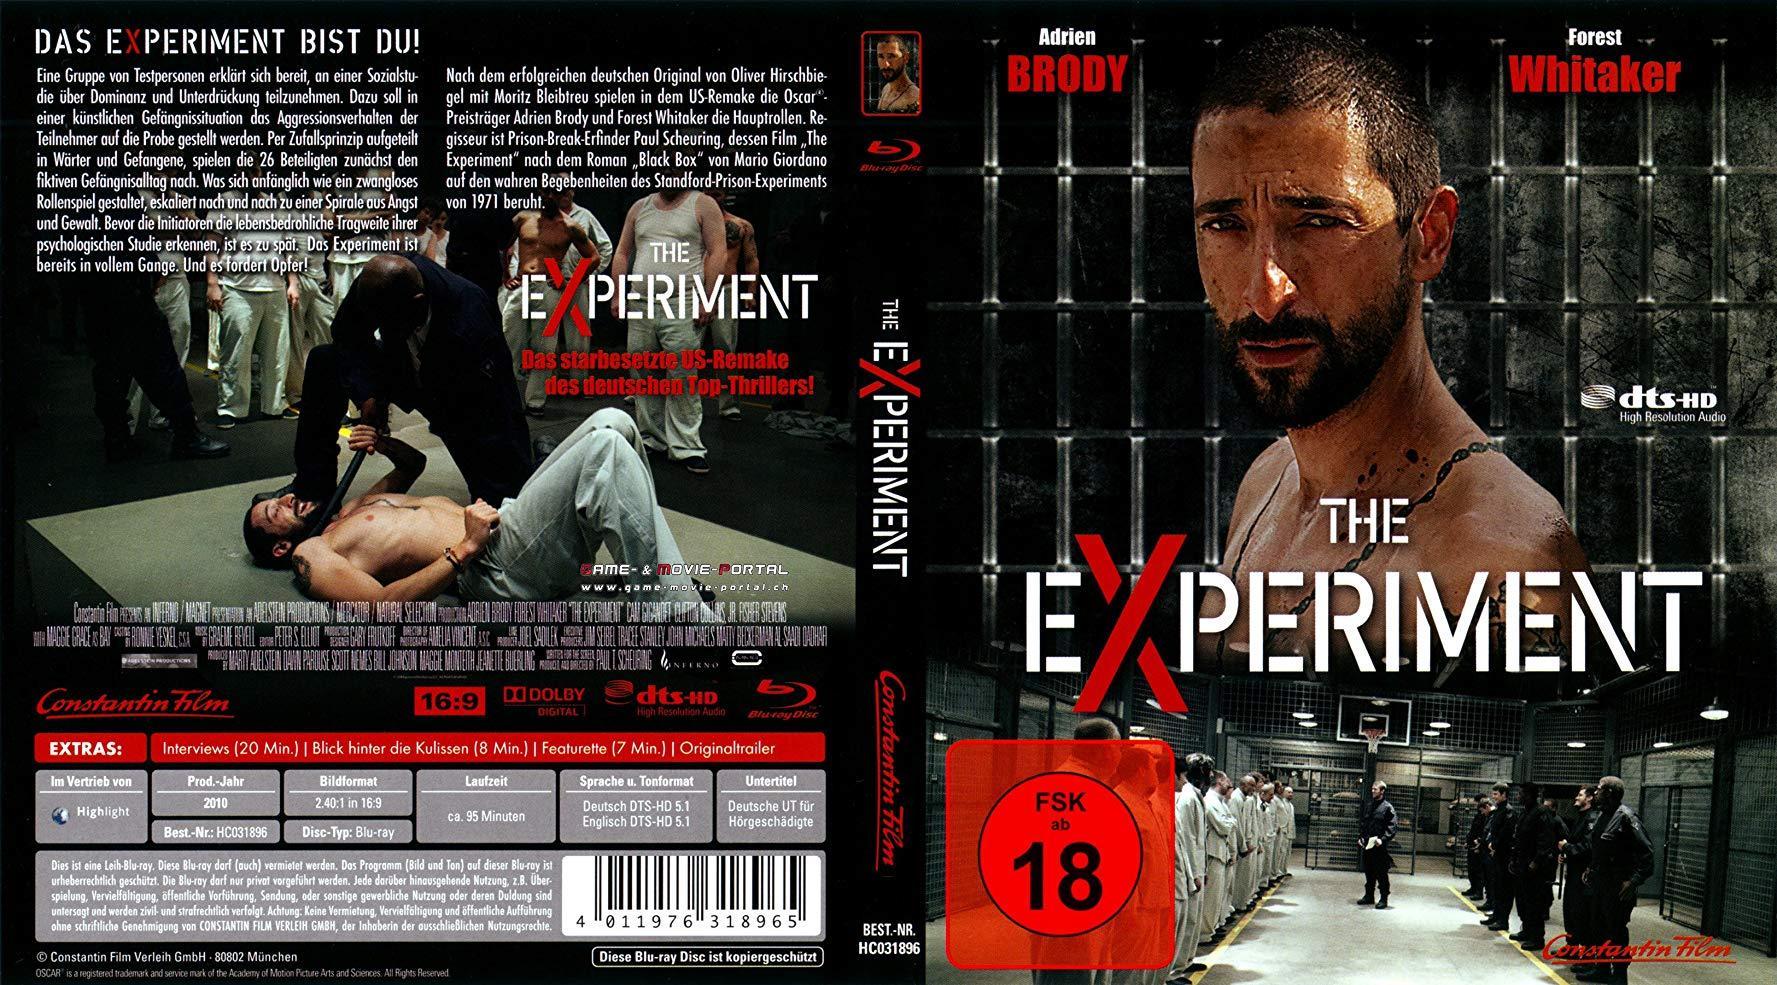 مشاهدة فيلم The Experiment 2010 HD مترجم كامل اون لاين